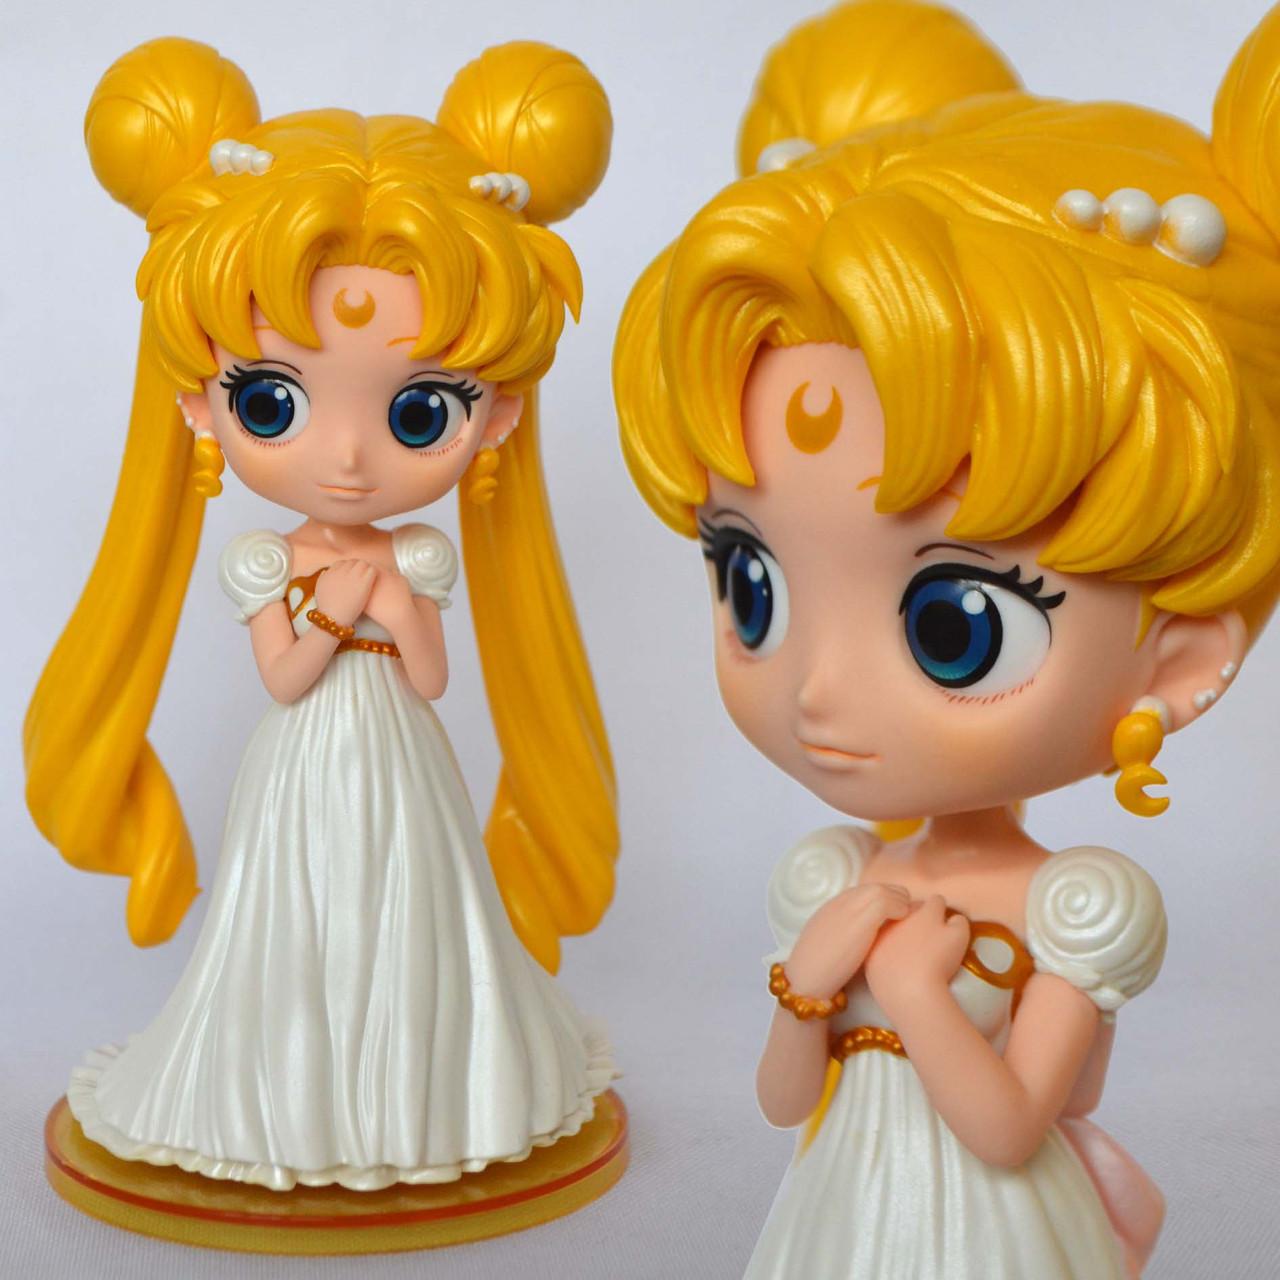 Аніме-фігурка Q Posket Princess Serenity